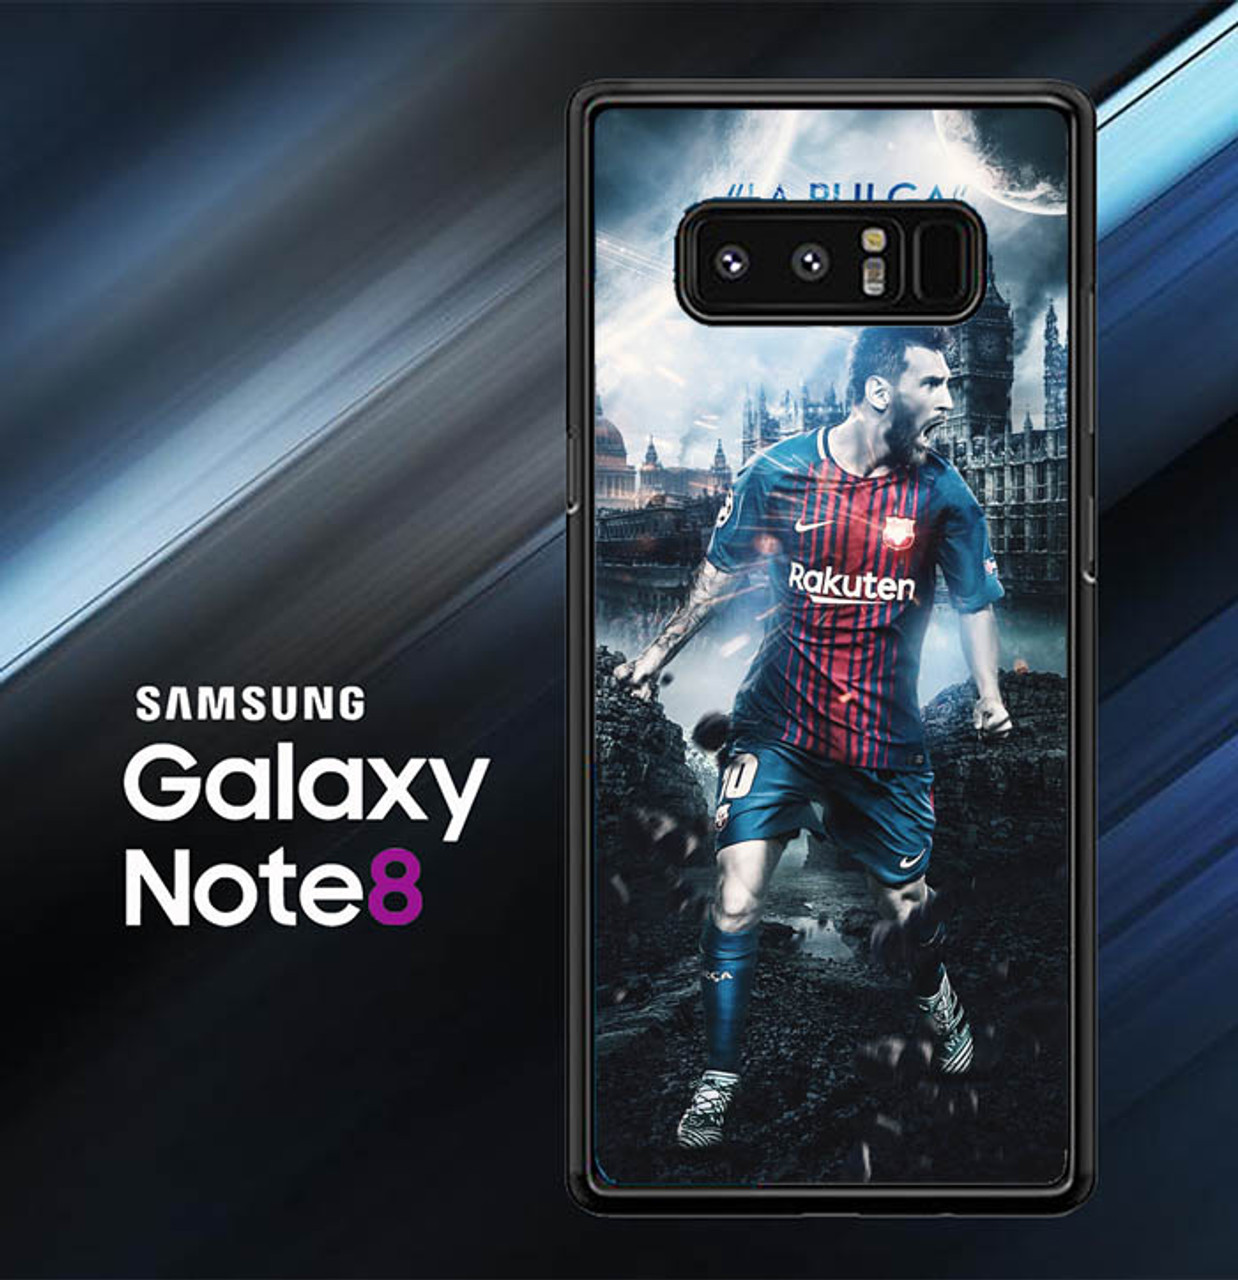 Lionel Messi Wallpaper X7018 Samsung Galaxy Note 8 Case